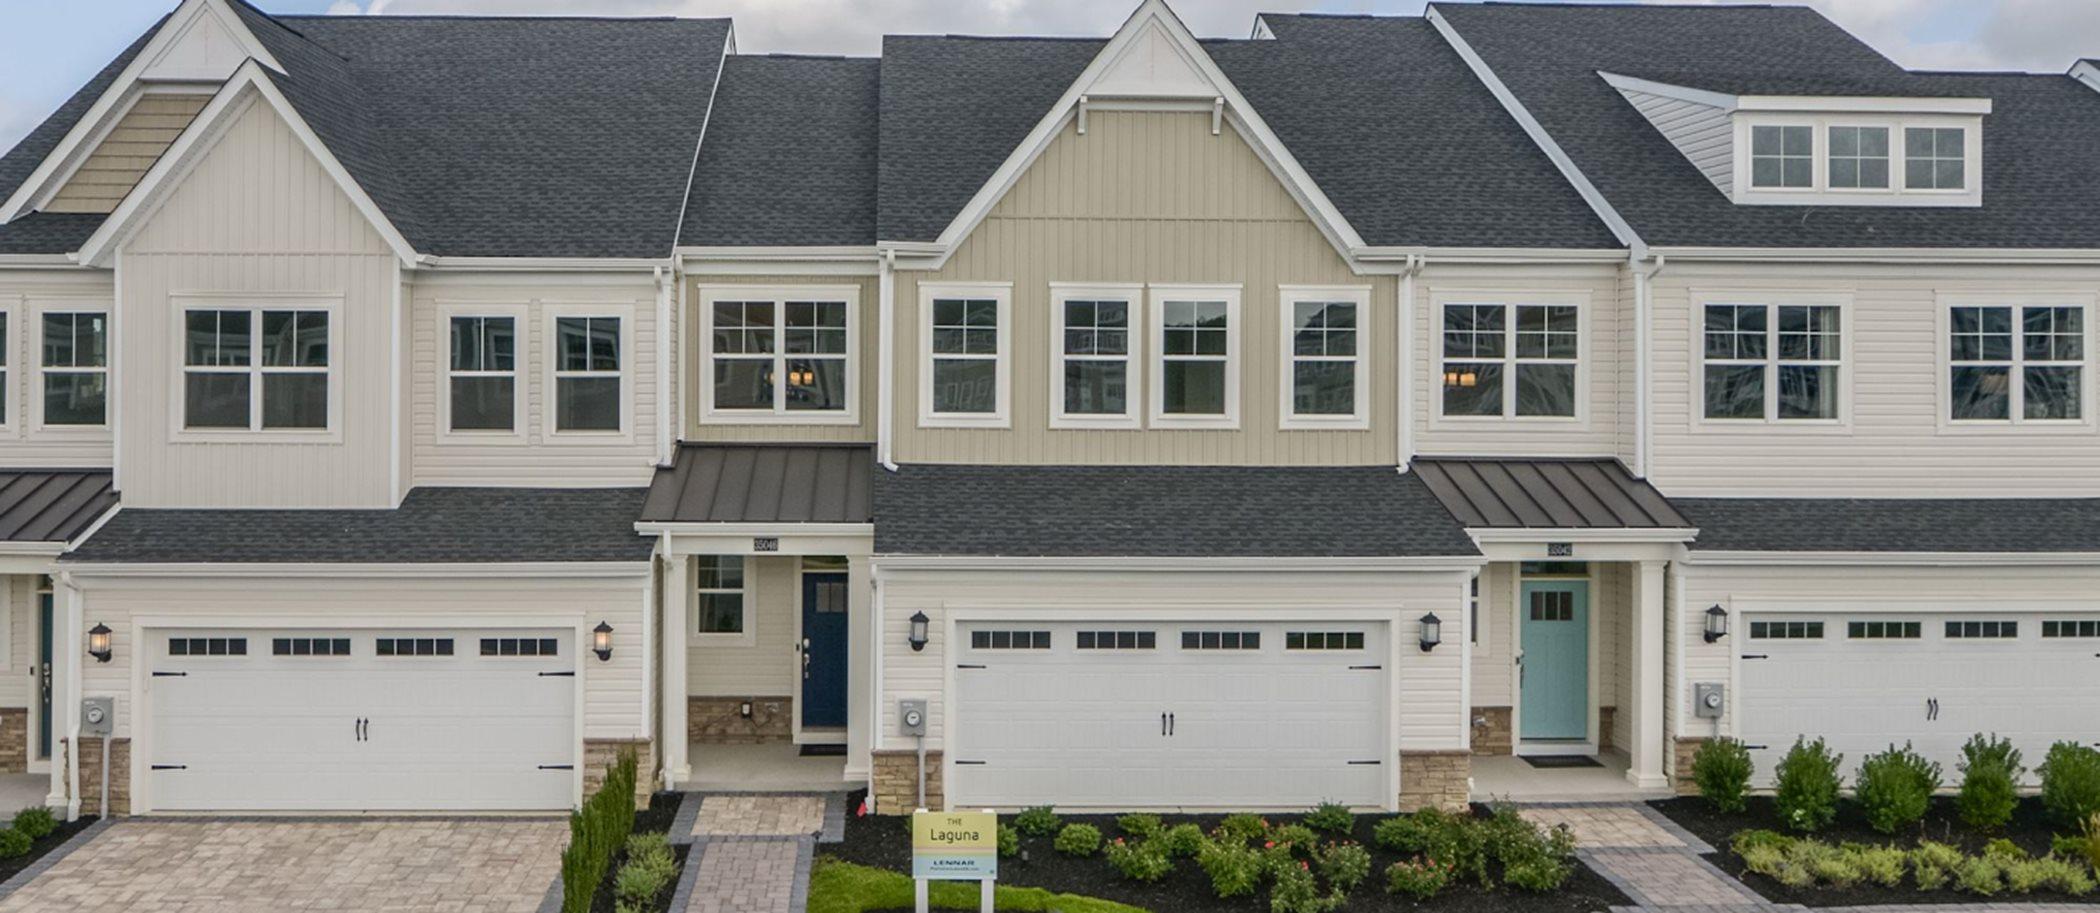 North Shore Villa Homes